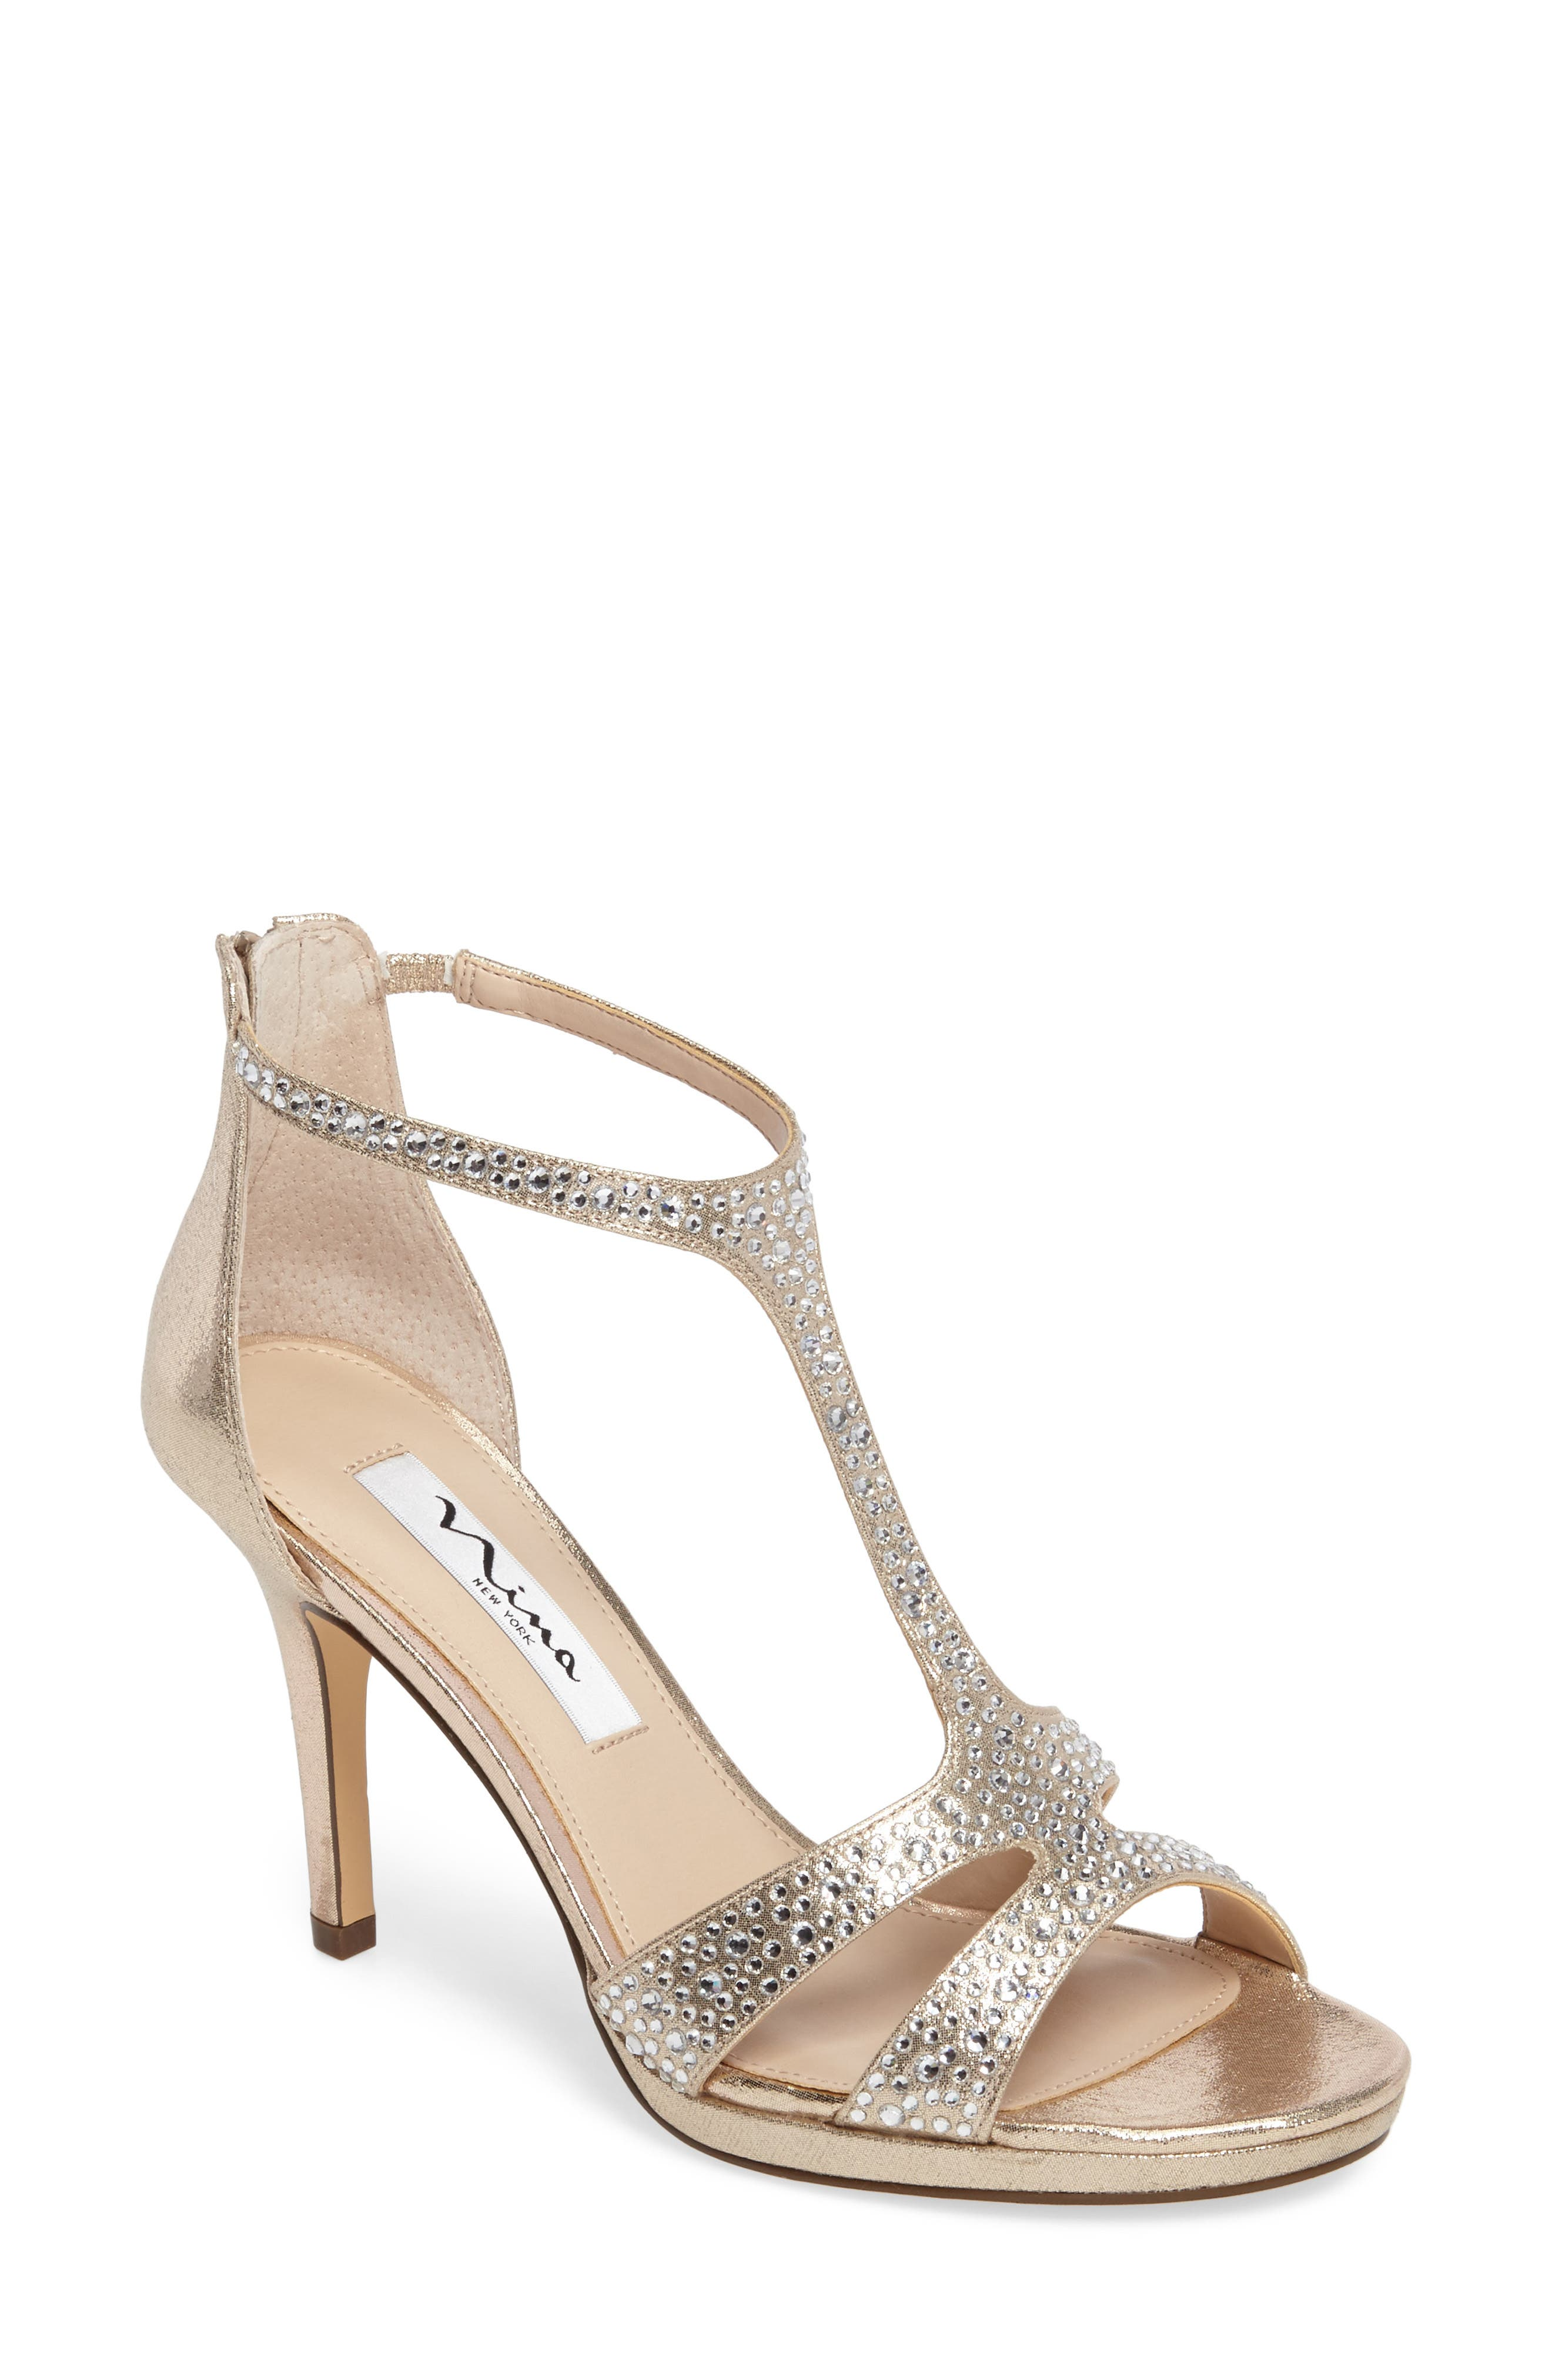 Alternate Image 1 Selected - Nina Brietta Embellished T-Strap Sandal (Women)